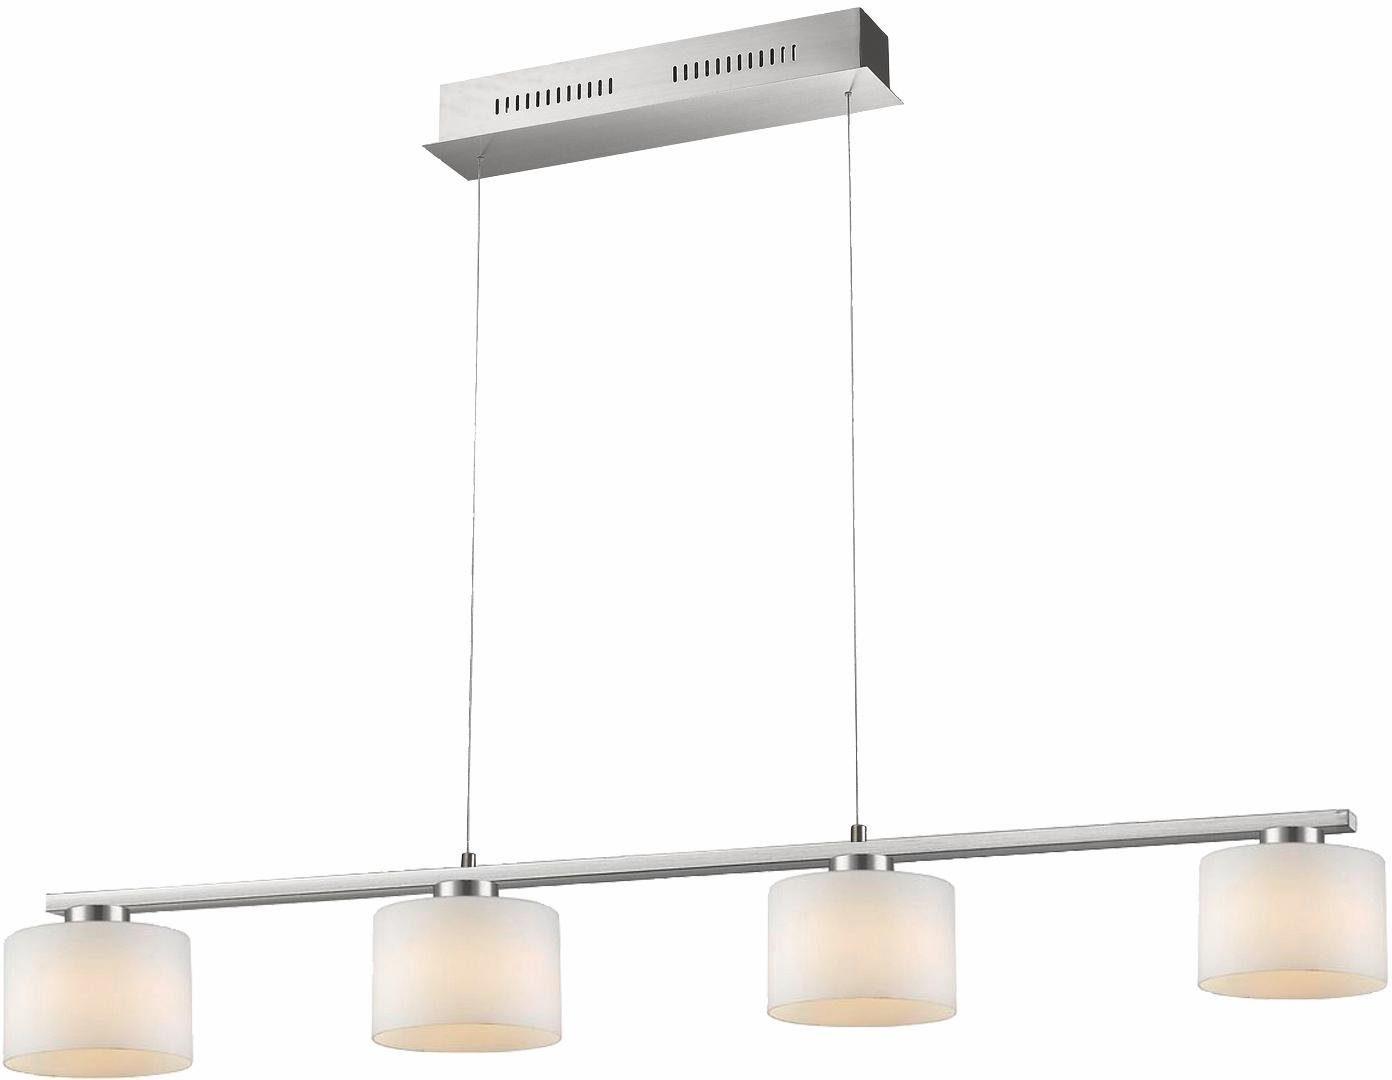 TRIO Leuchten LED Pendelleuchte »ALEGRO«, 4-flammig